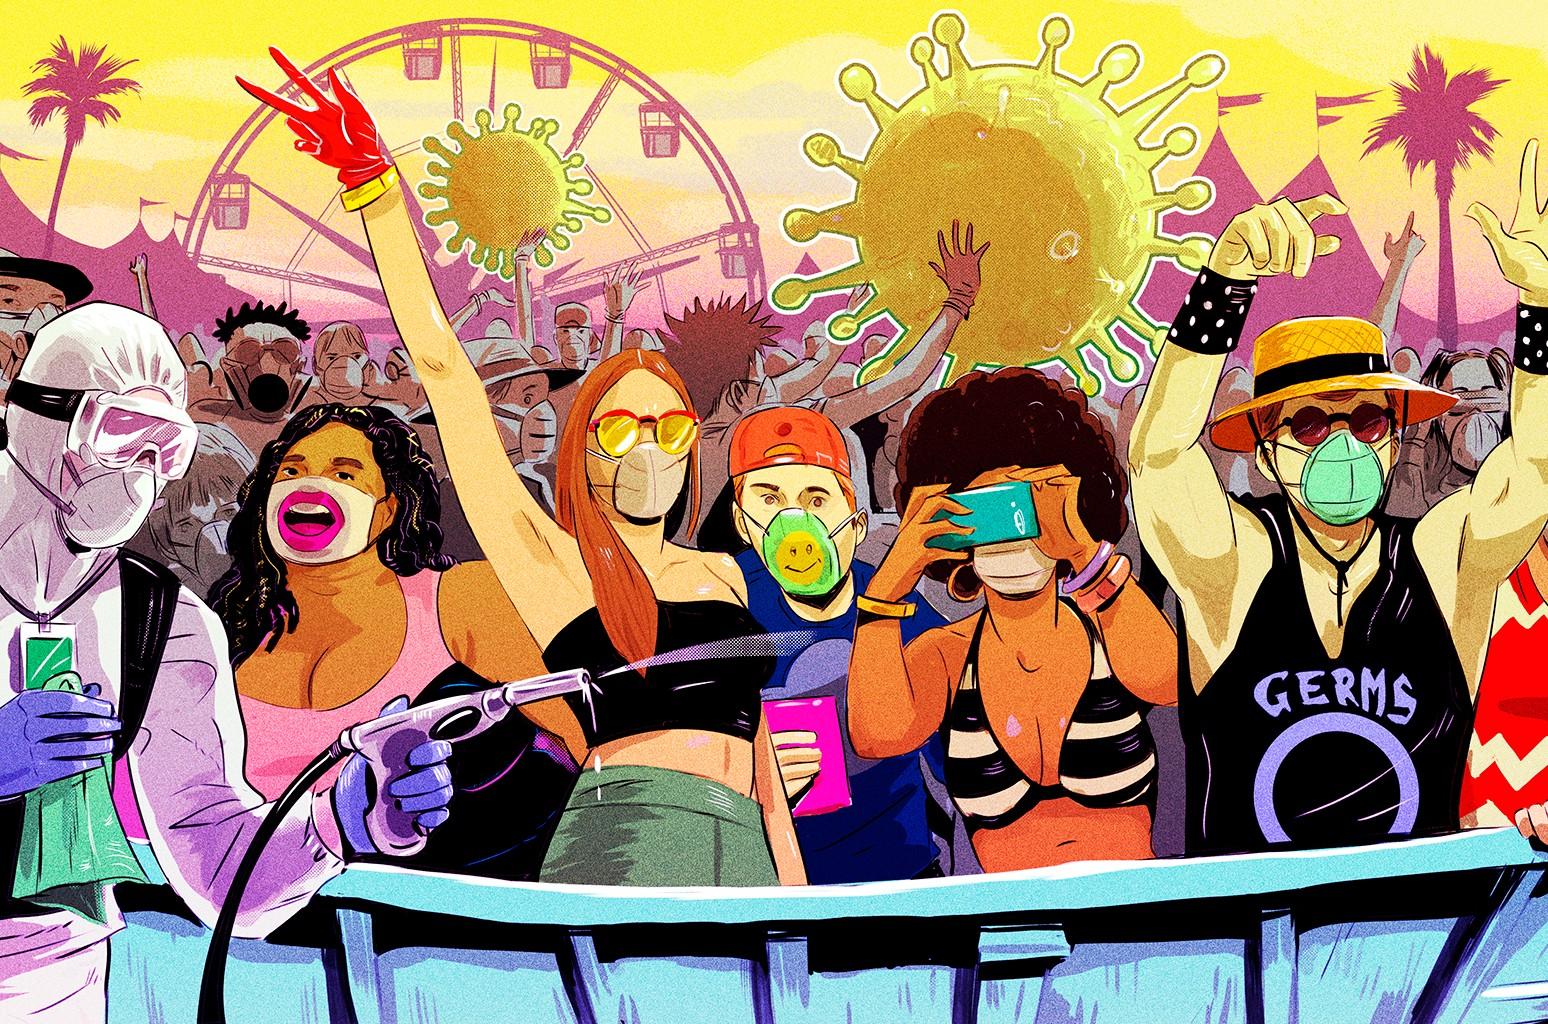 Concert Industry Faces Cruel, Cruel Summer as Coronavirus Spreads